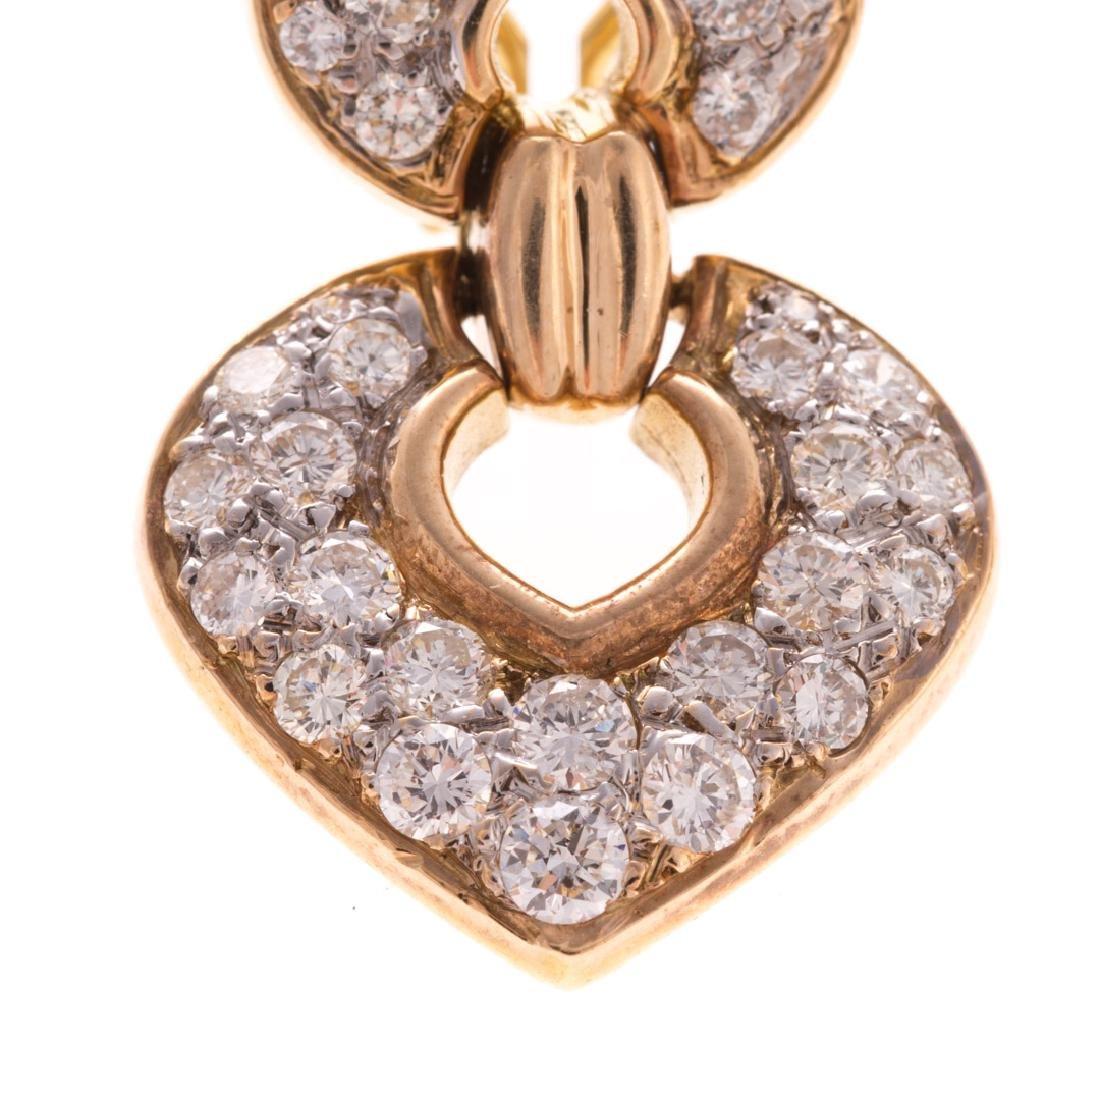 A Lady's 14K Diamond Ear Pendants - 2